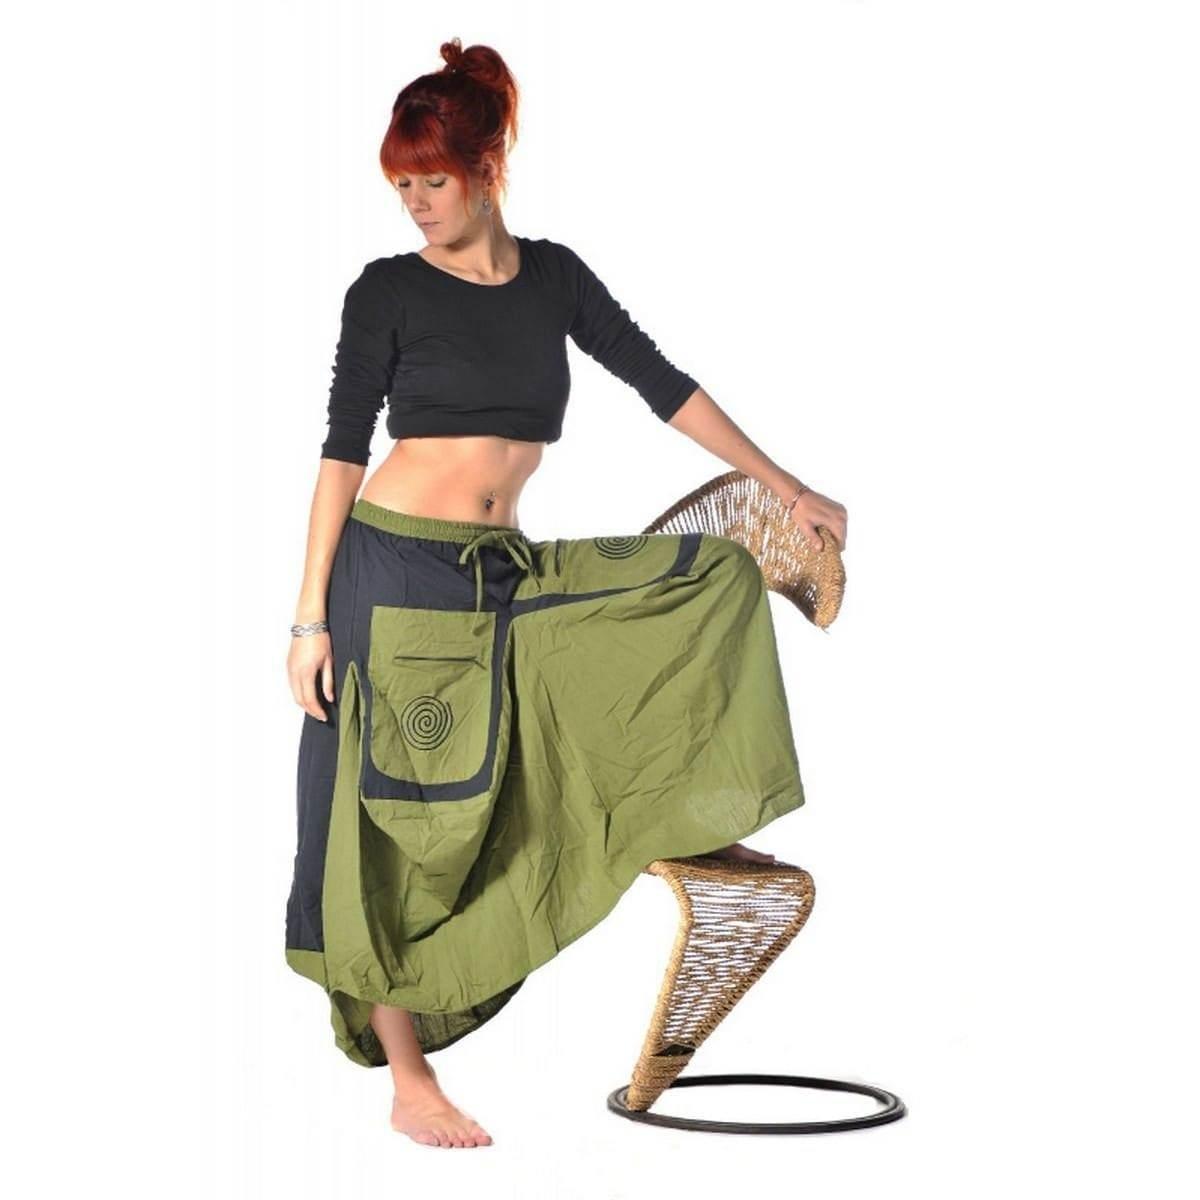 details zu rock mittelalter maxirock hippie goa psy sommerrock unterrock  gummizug jupe